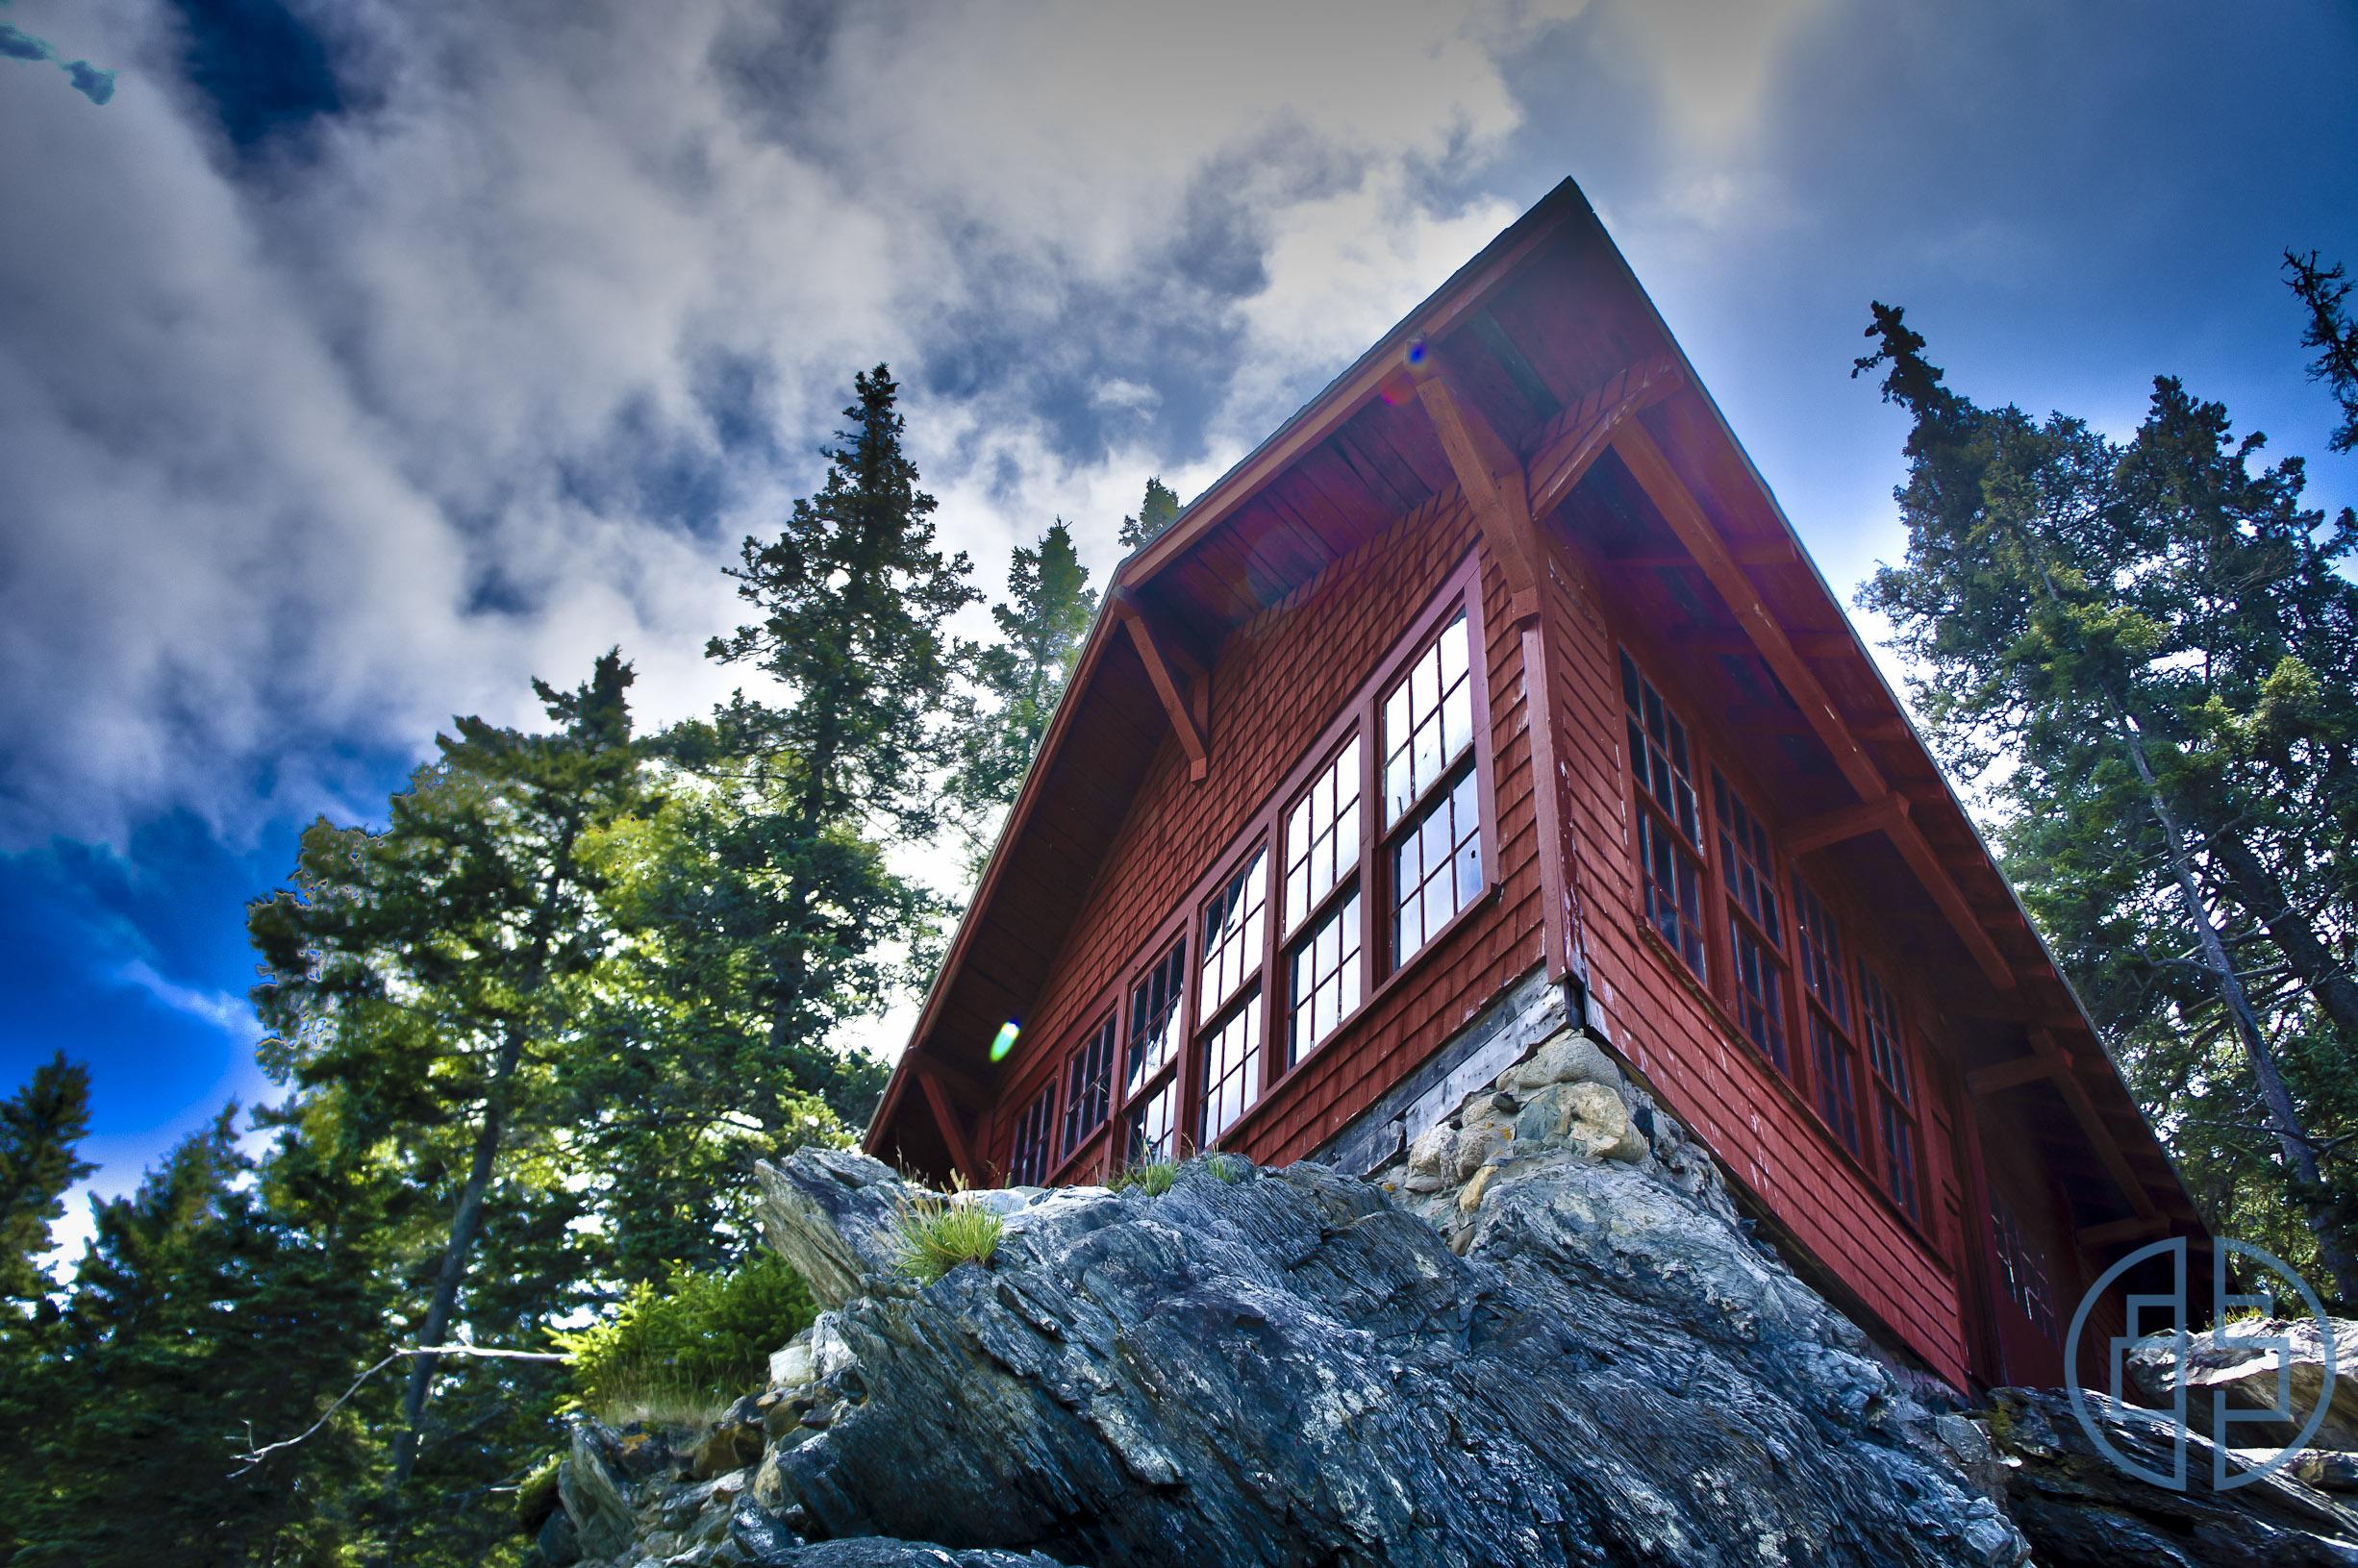 20110805-Maine_Boathouse_HDR2.jpg